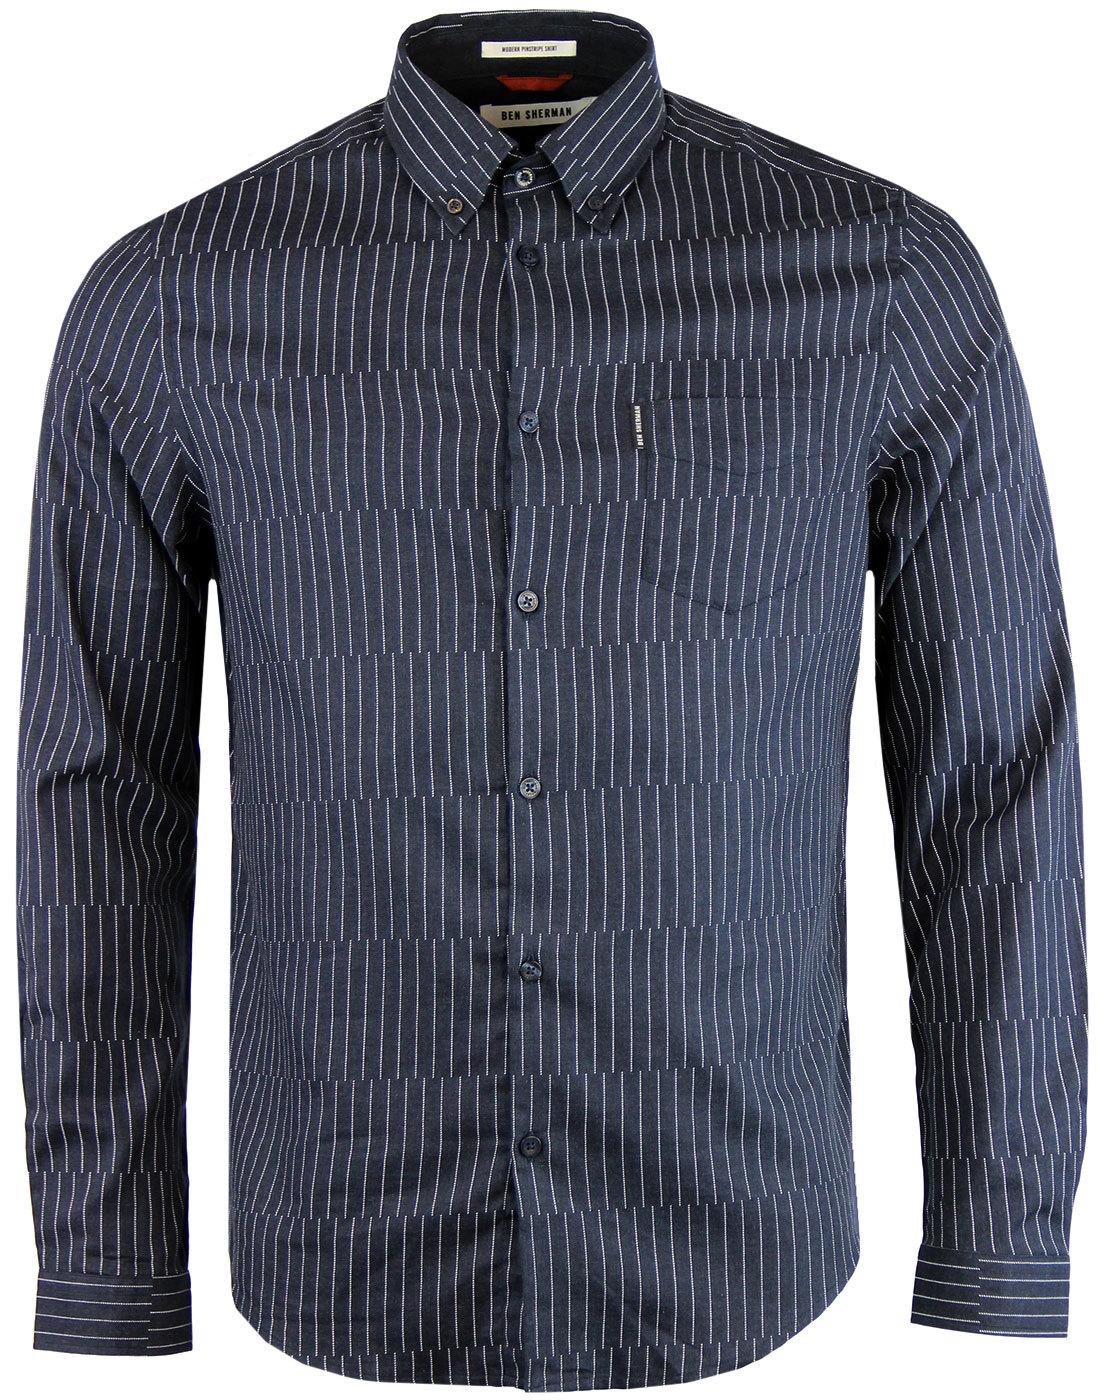 Modern Pinstripe BEN SHERMAN Retro Mod Shirt